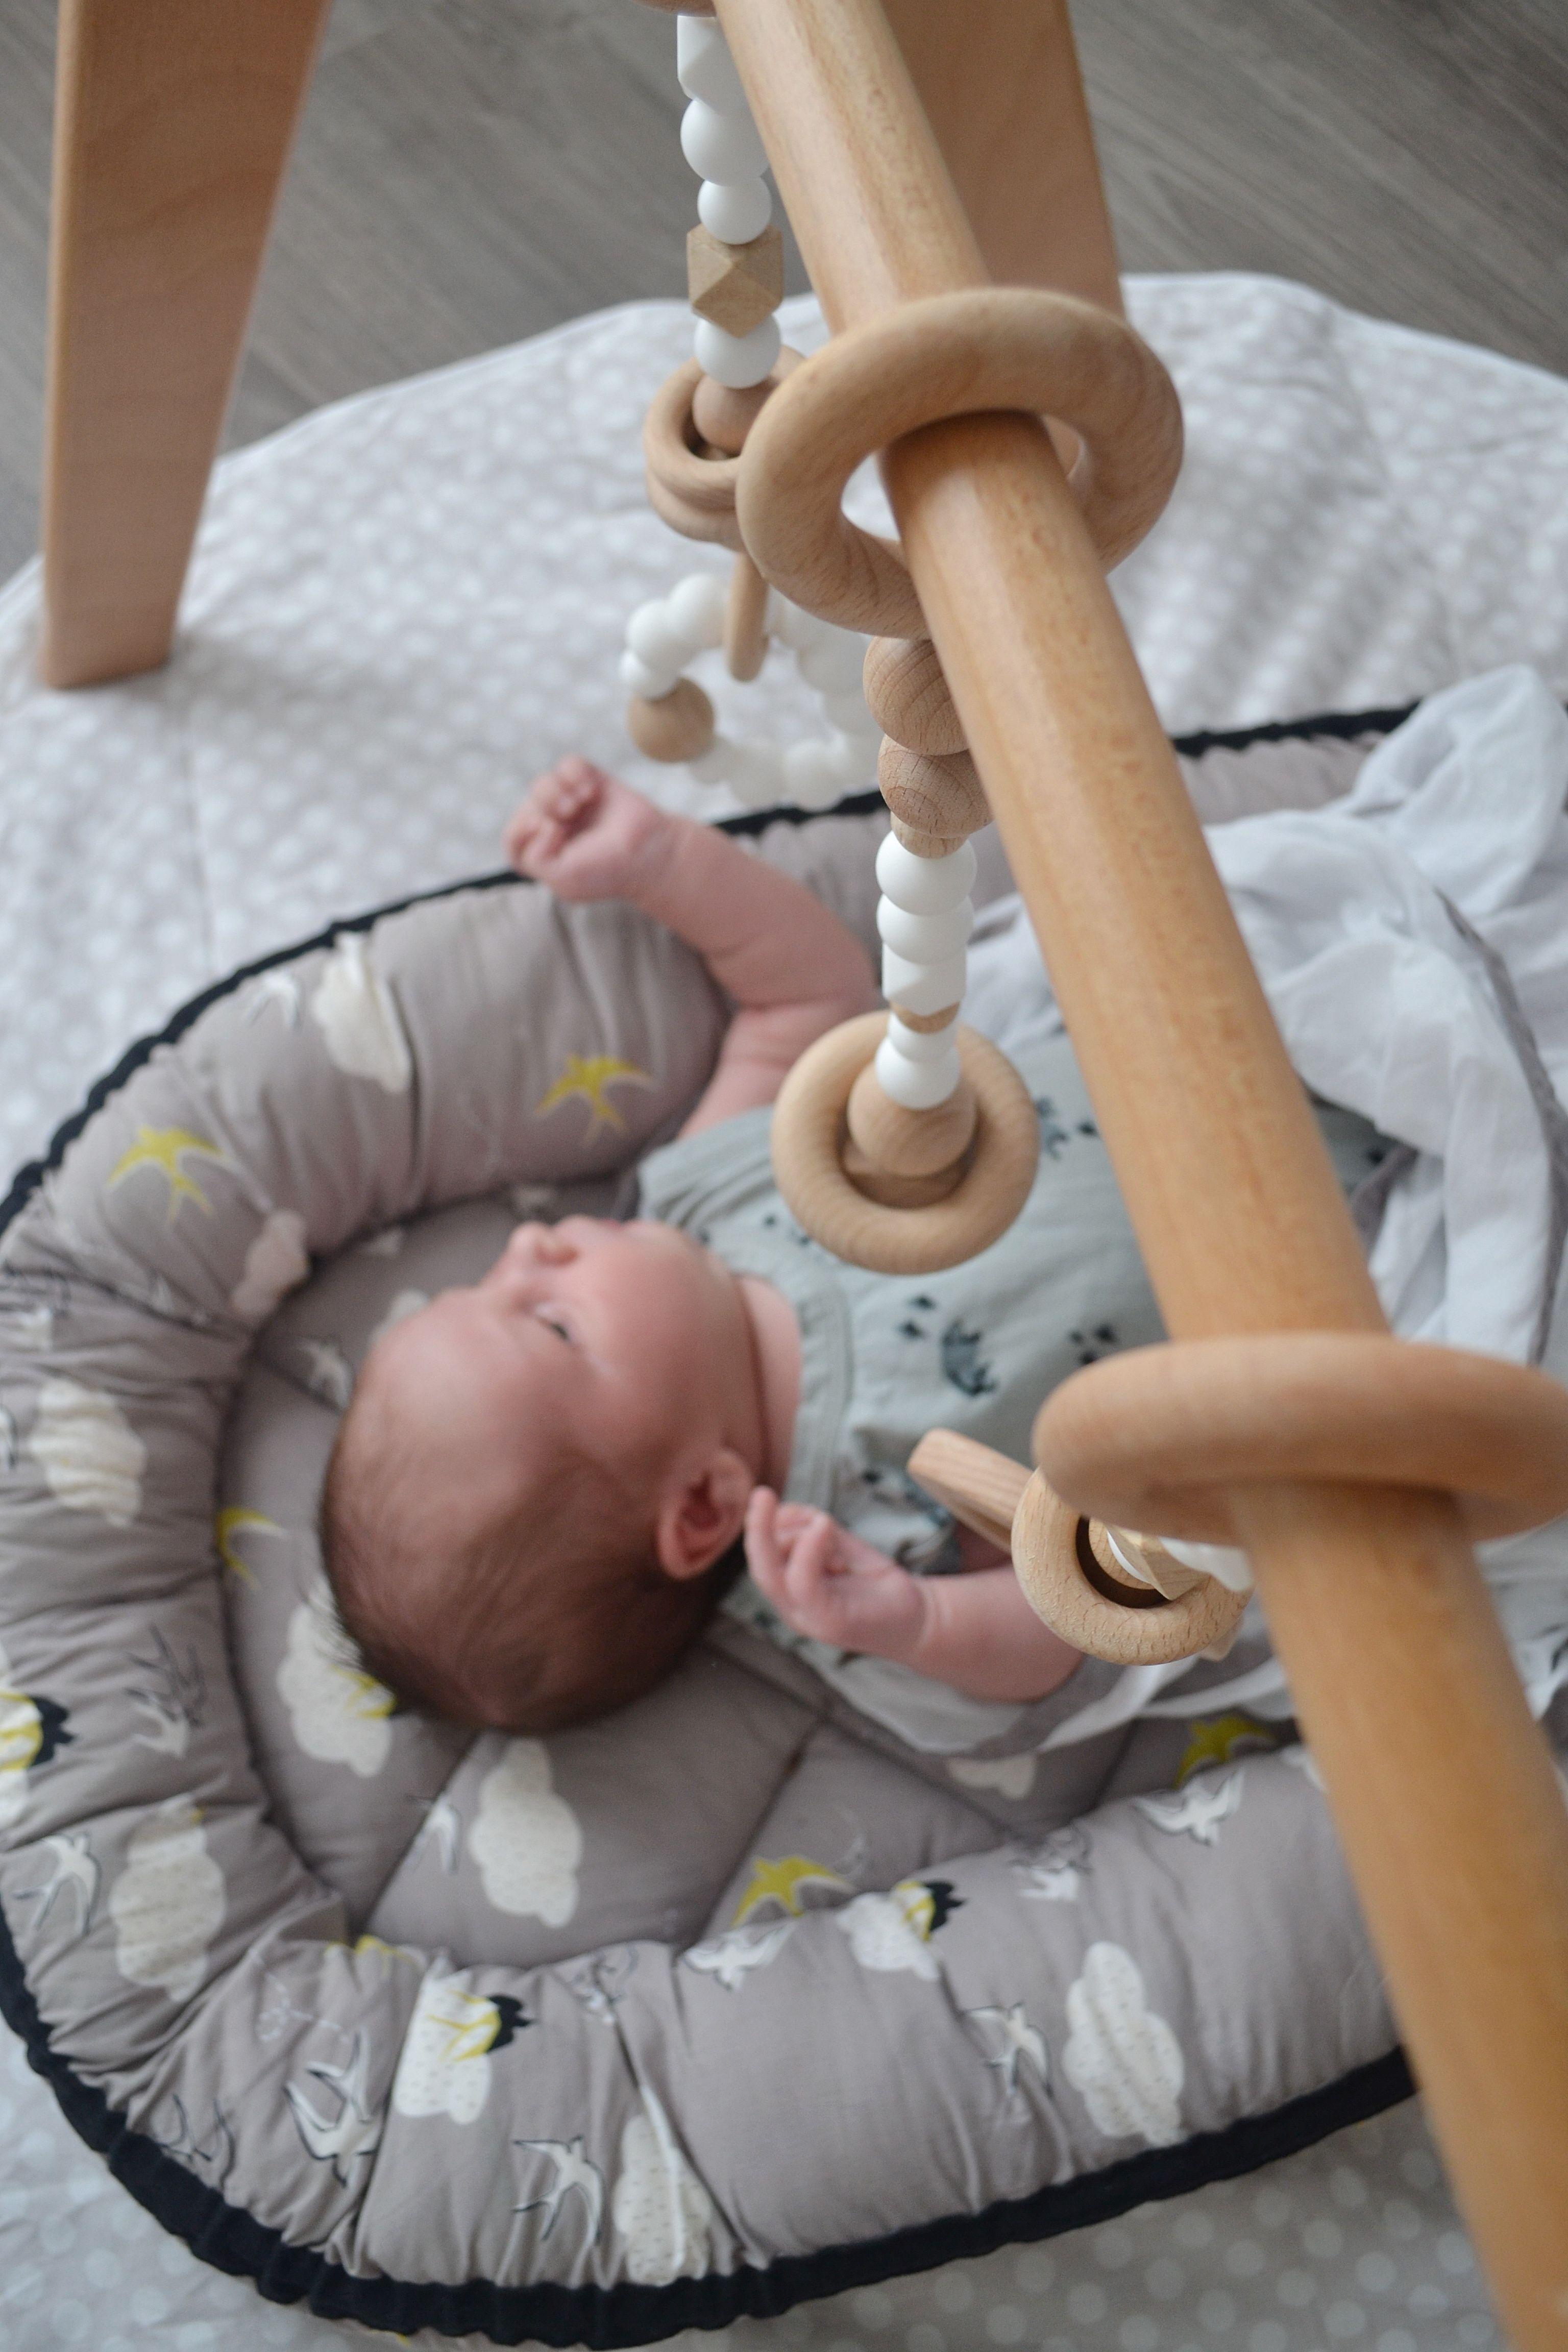 Modern Monty Heirloom Quality Wooden Play Gym A Minimalist Baby Toy